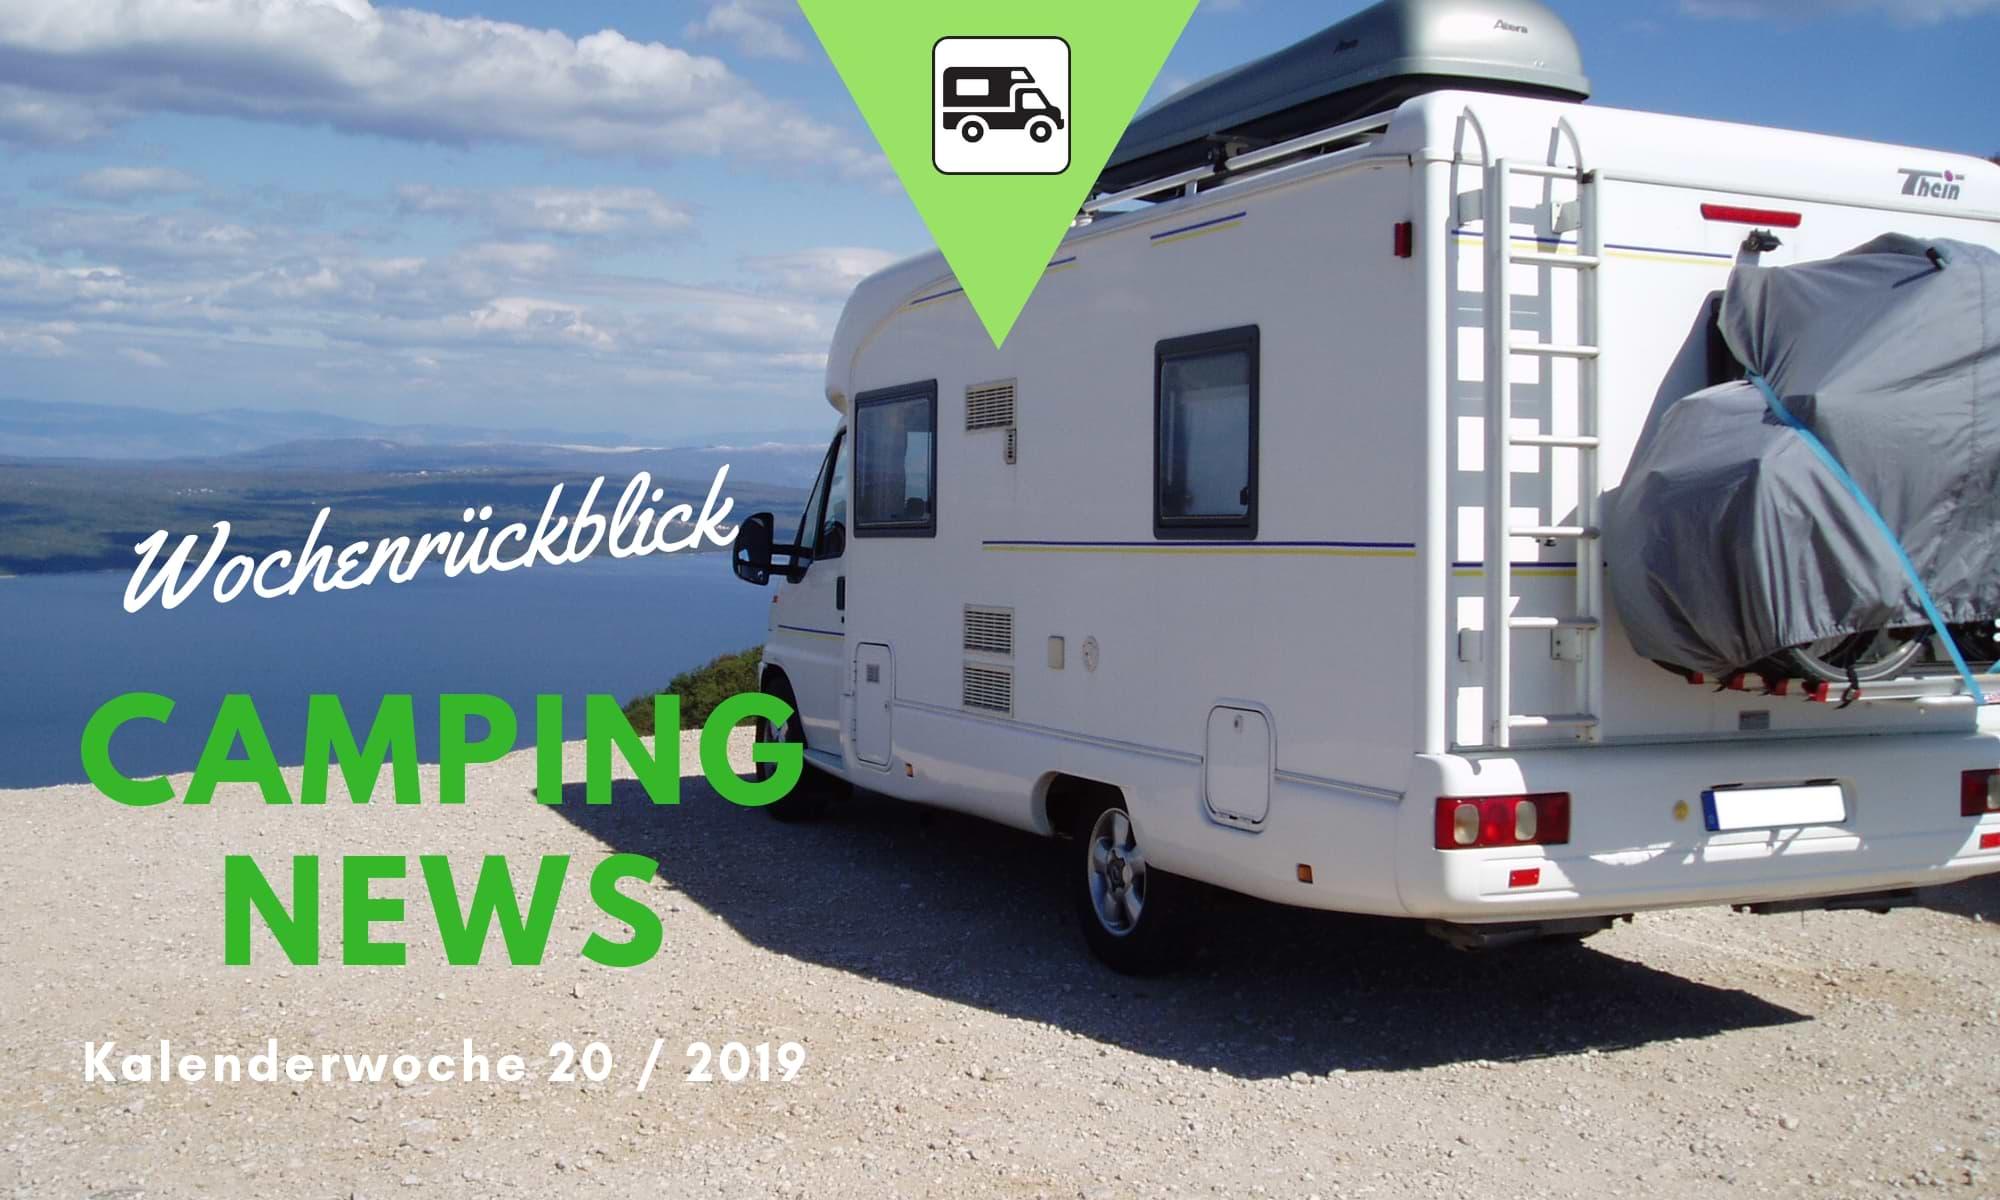 Wochenrückblick Camping News KW20-2019